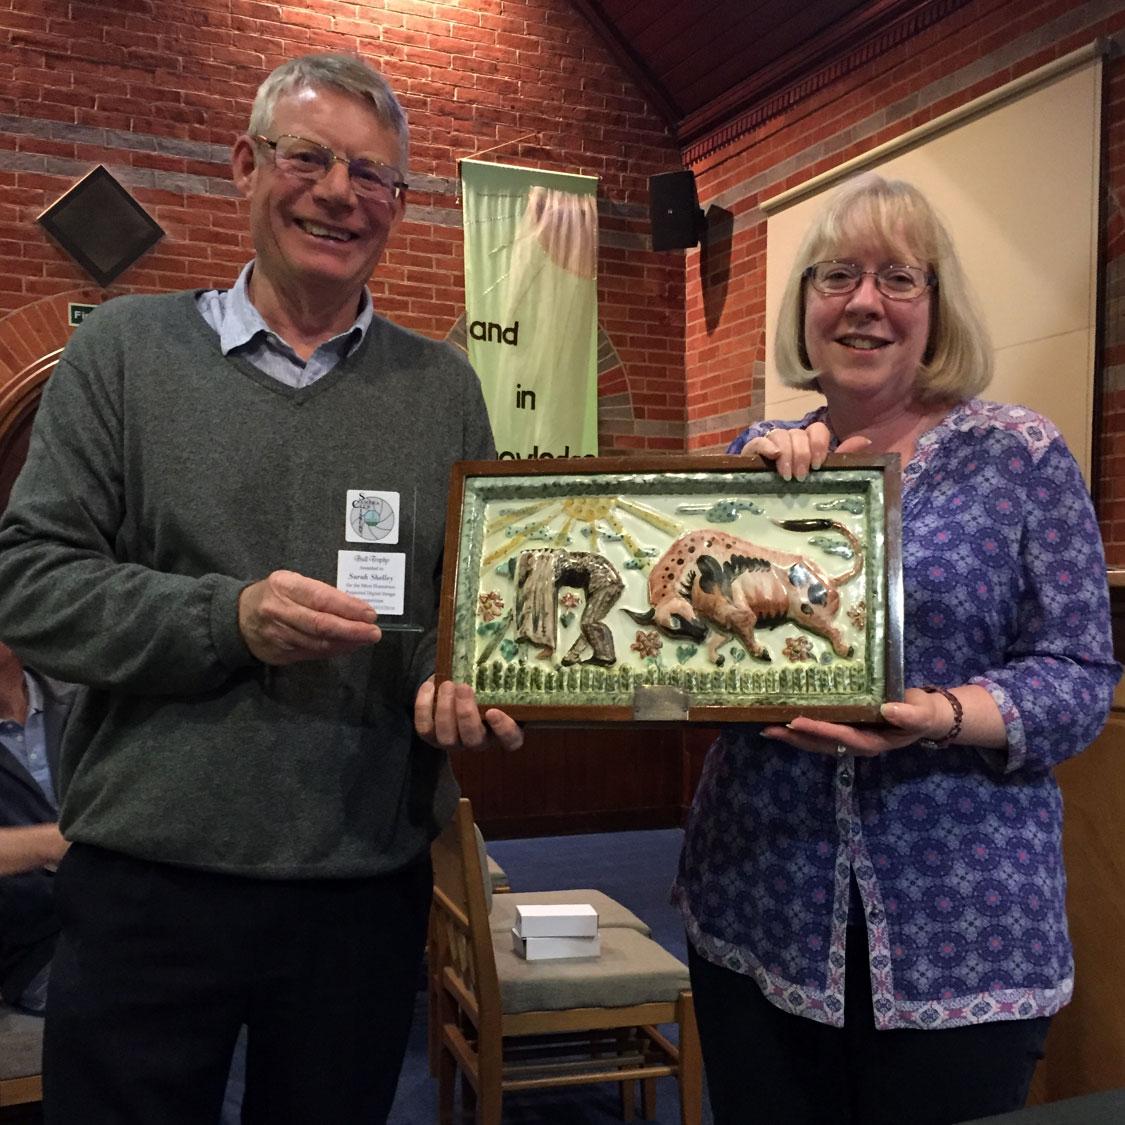 Bull Trophy Winner Sarah Shelley